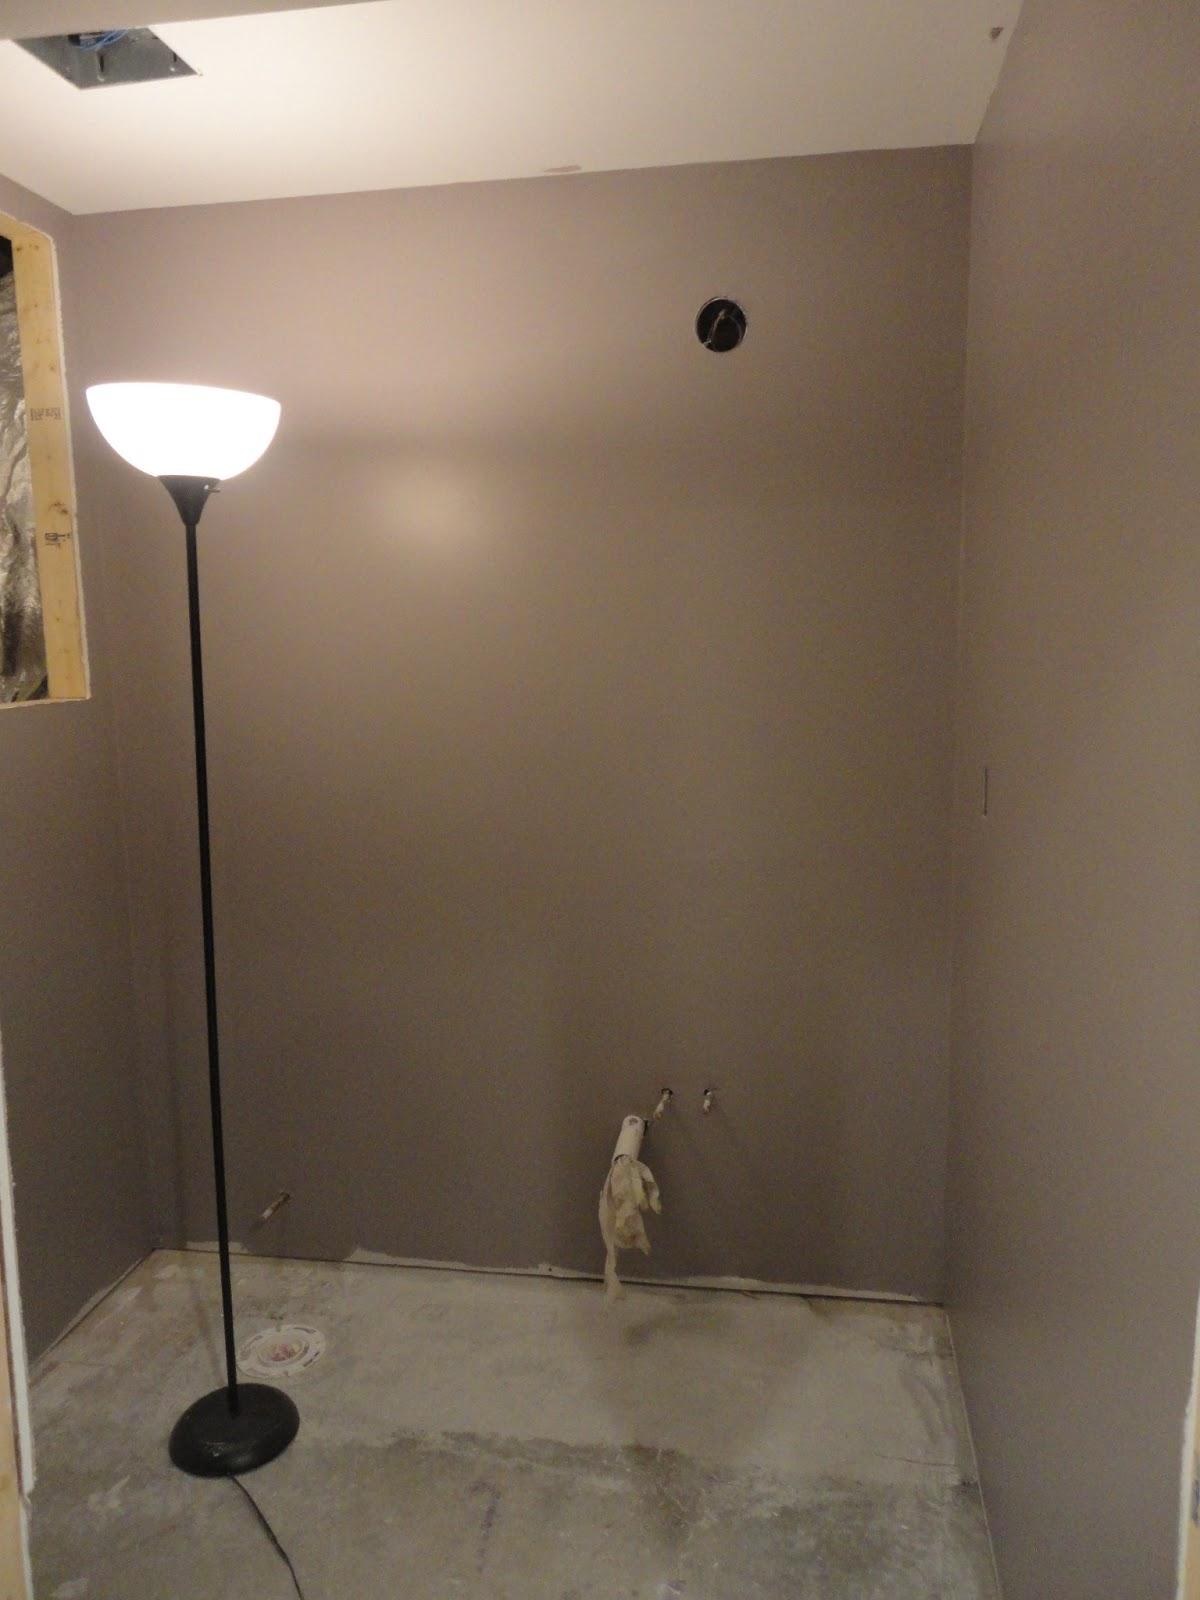 Primer for bathroom ceiling - Primer For Bathroom Ceiling 46